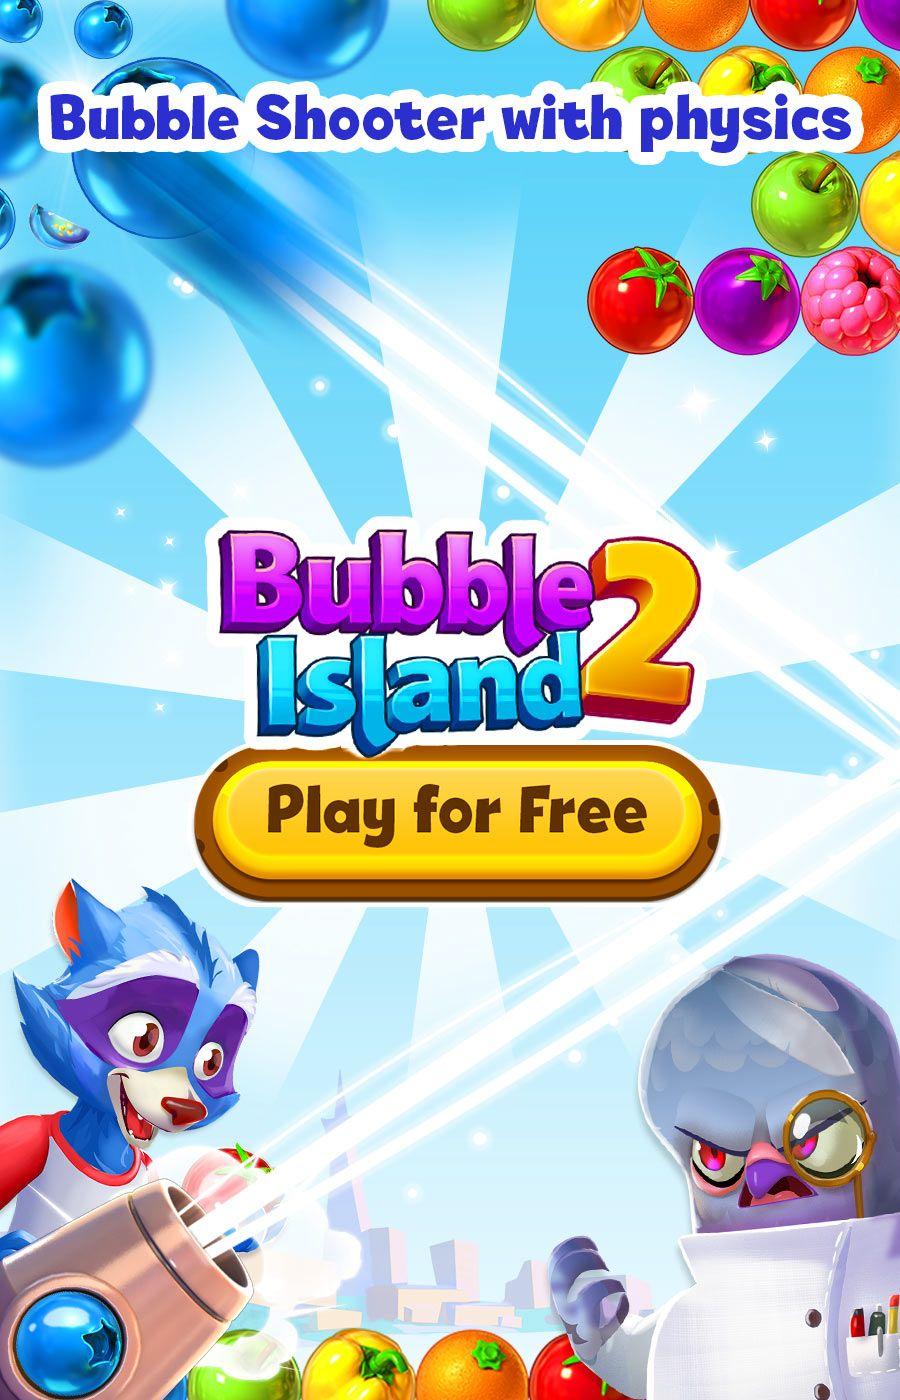 Physics Based Fun! Play Bubble Island 2 Fruit Shooter on